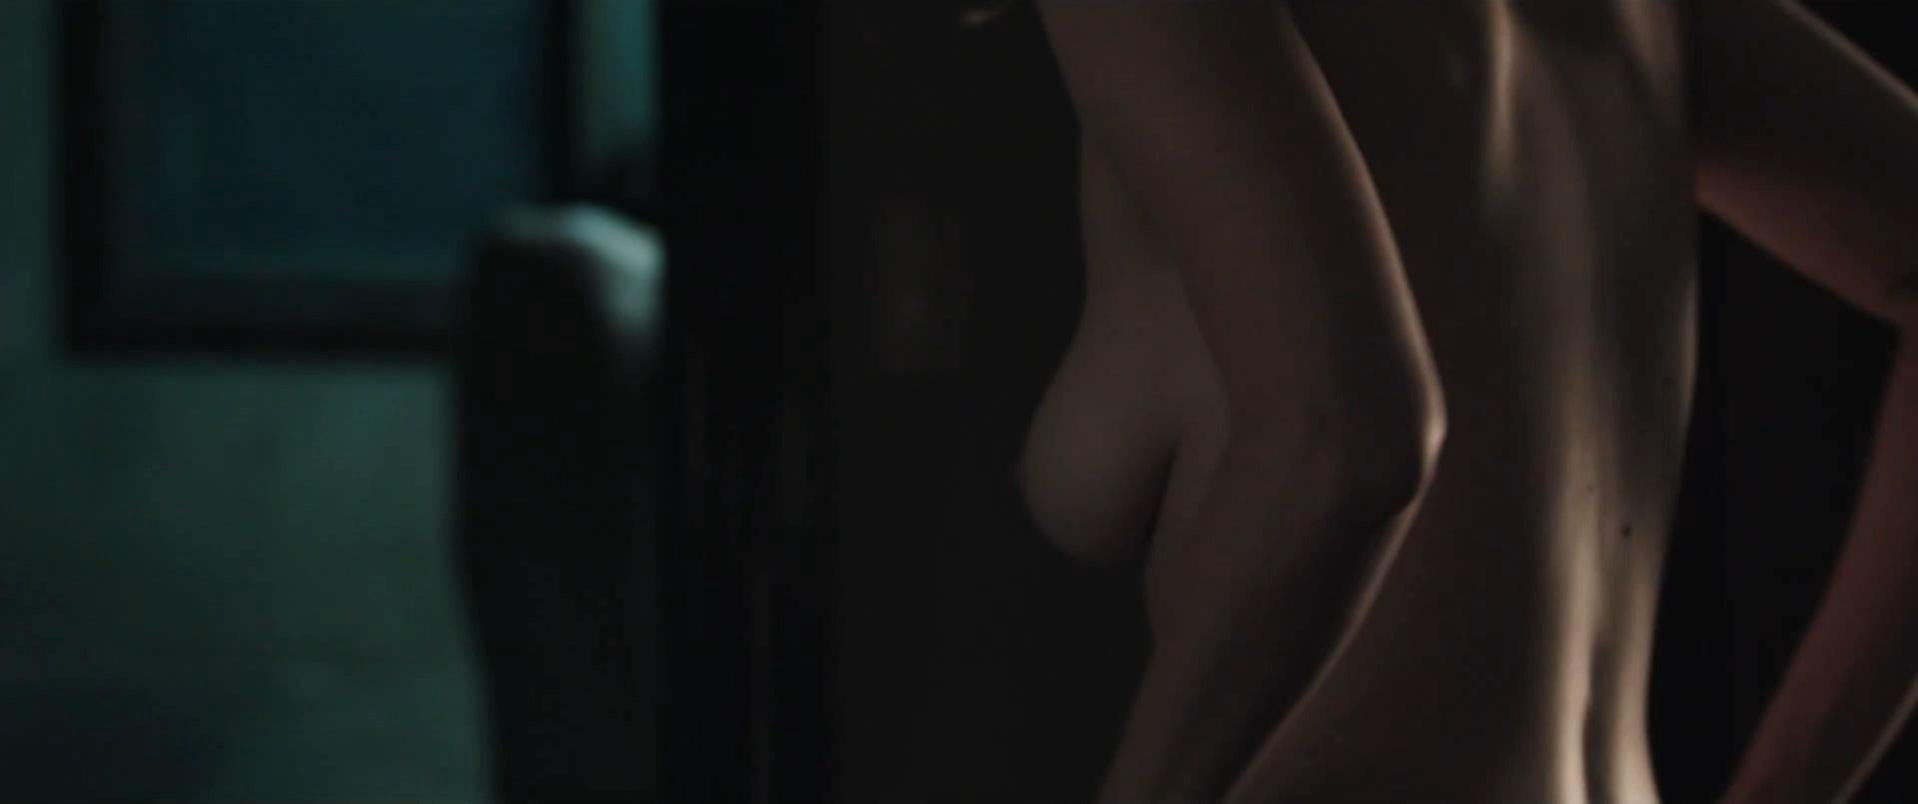 Leeanna Walsman nude - Dawn (2015)